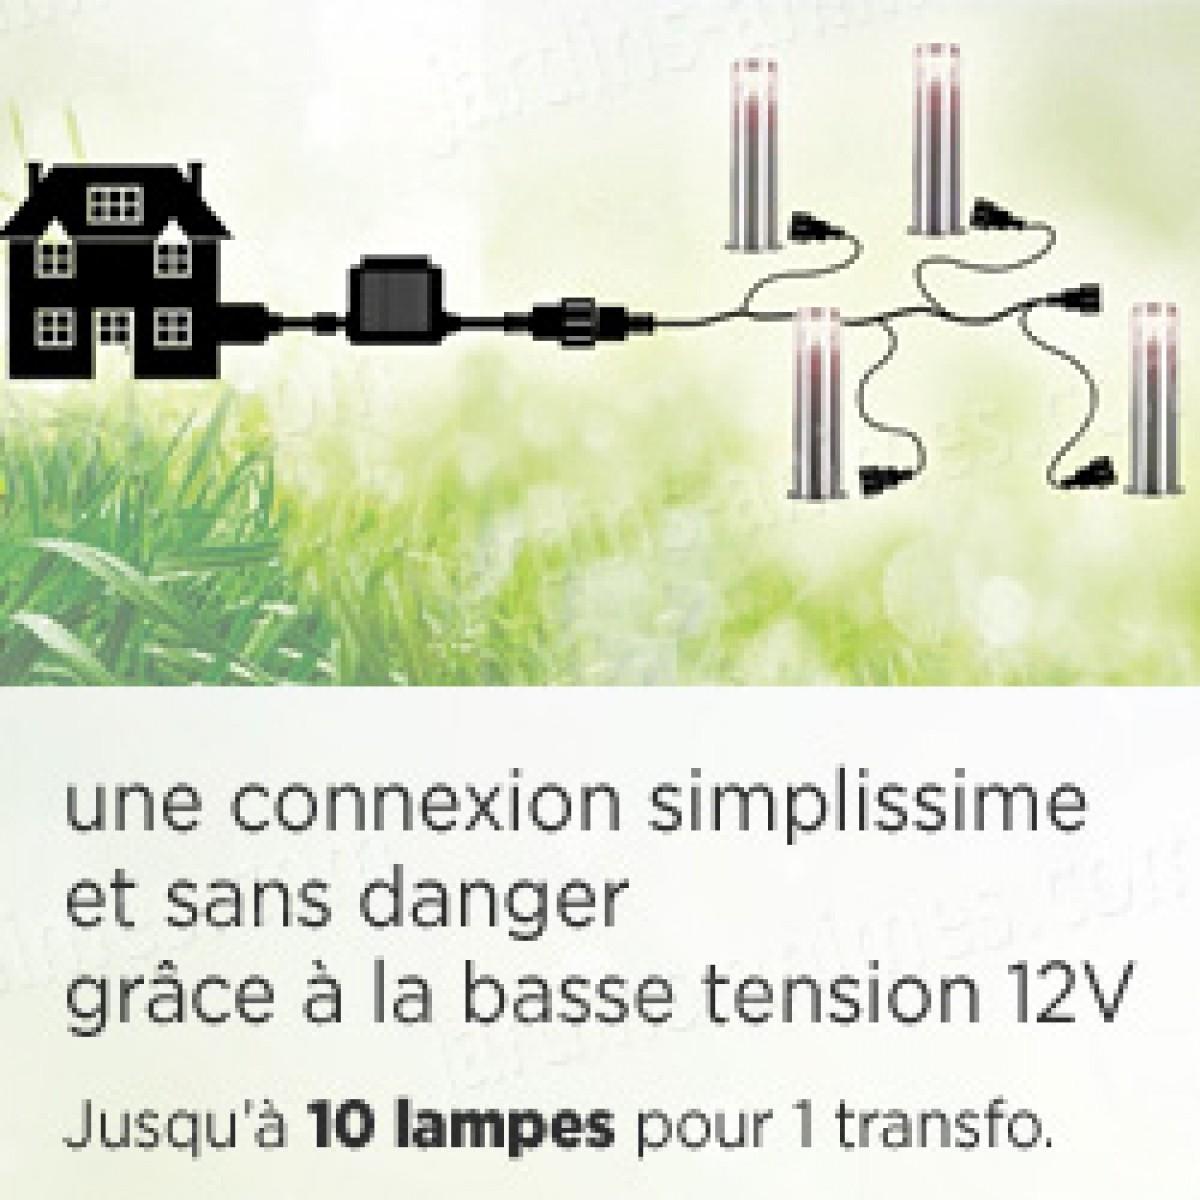 tuinverlichting verlengkabel vier connecties. Black Bedroom Furniture Sets. Home Design Ideas